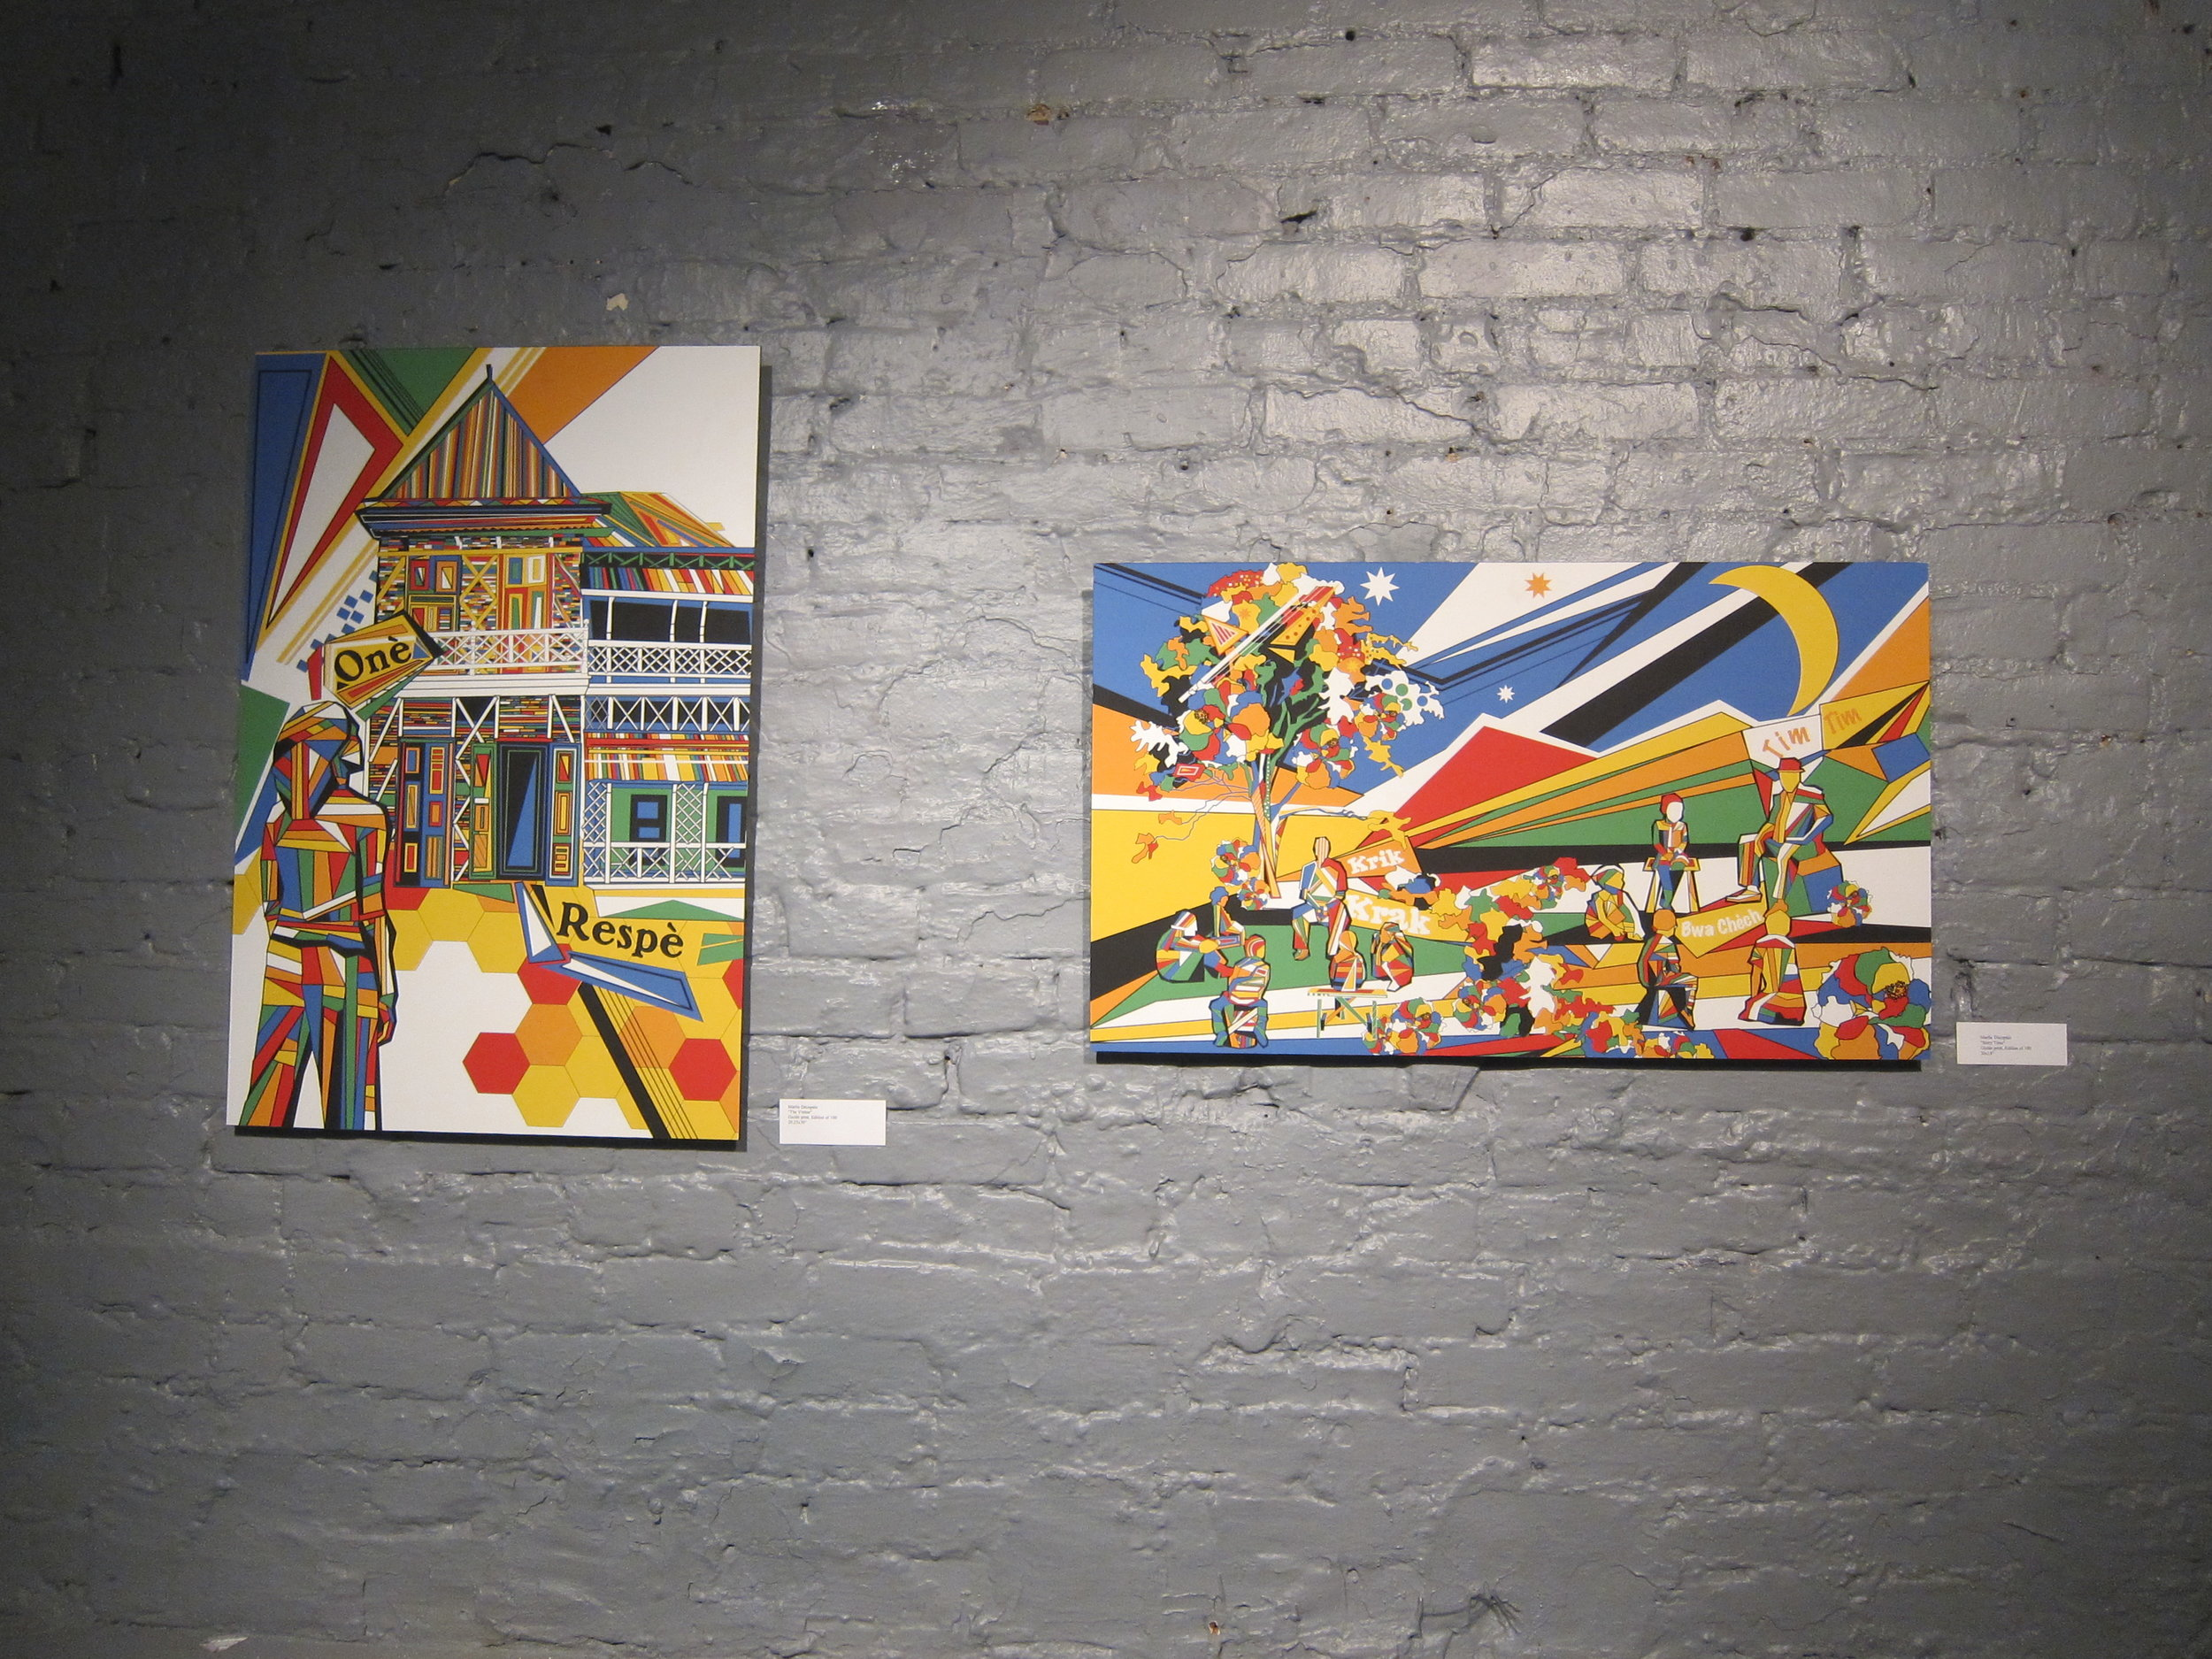 Exhibition at Five myles galLery